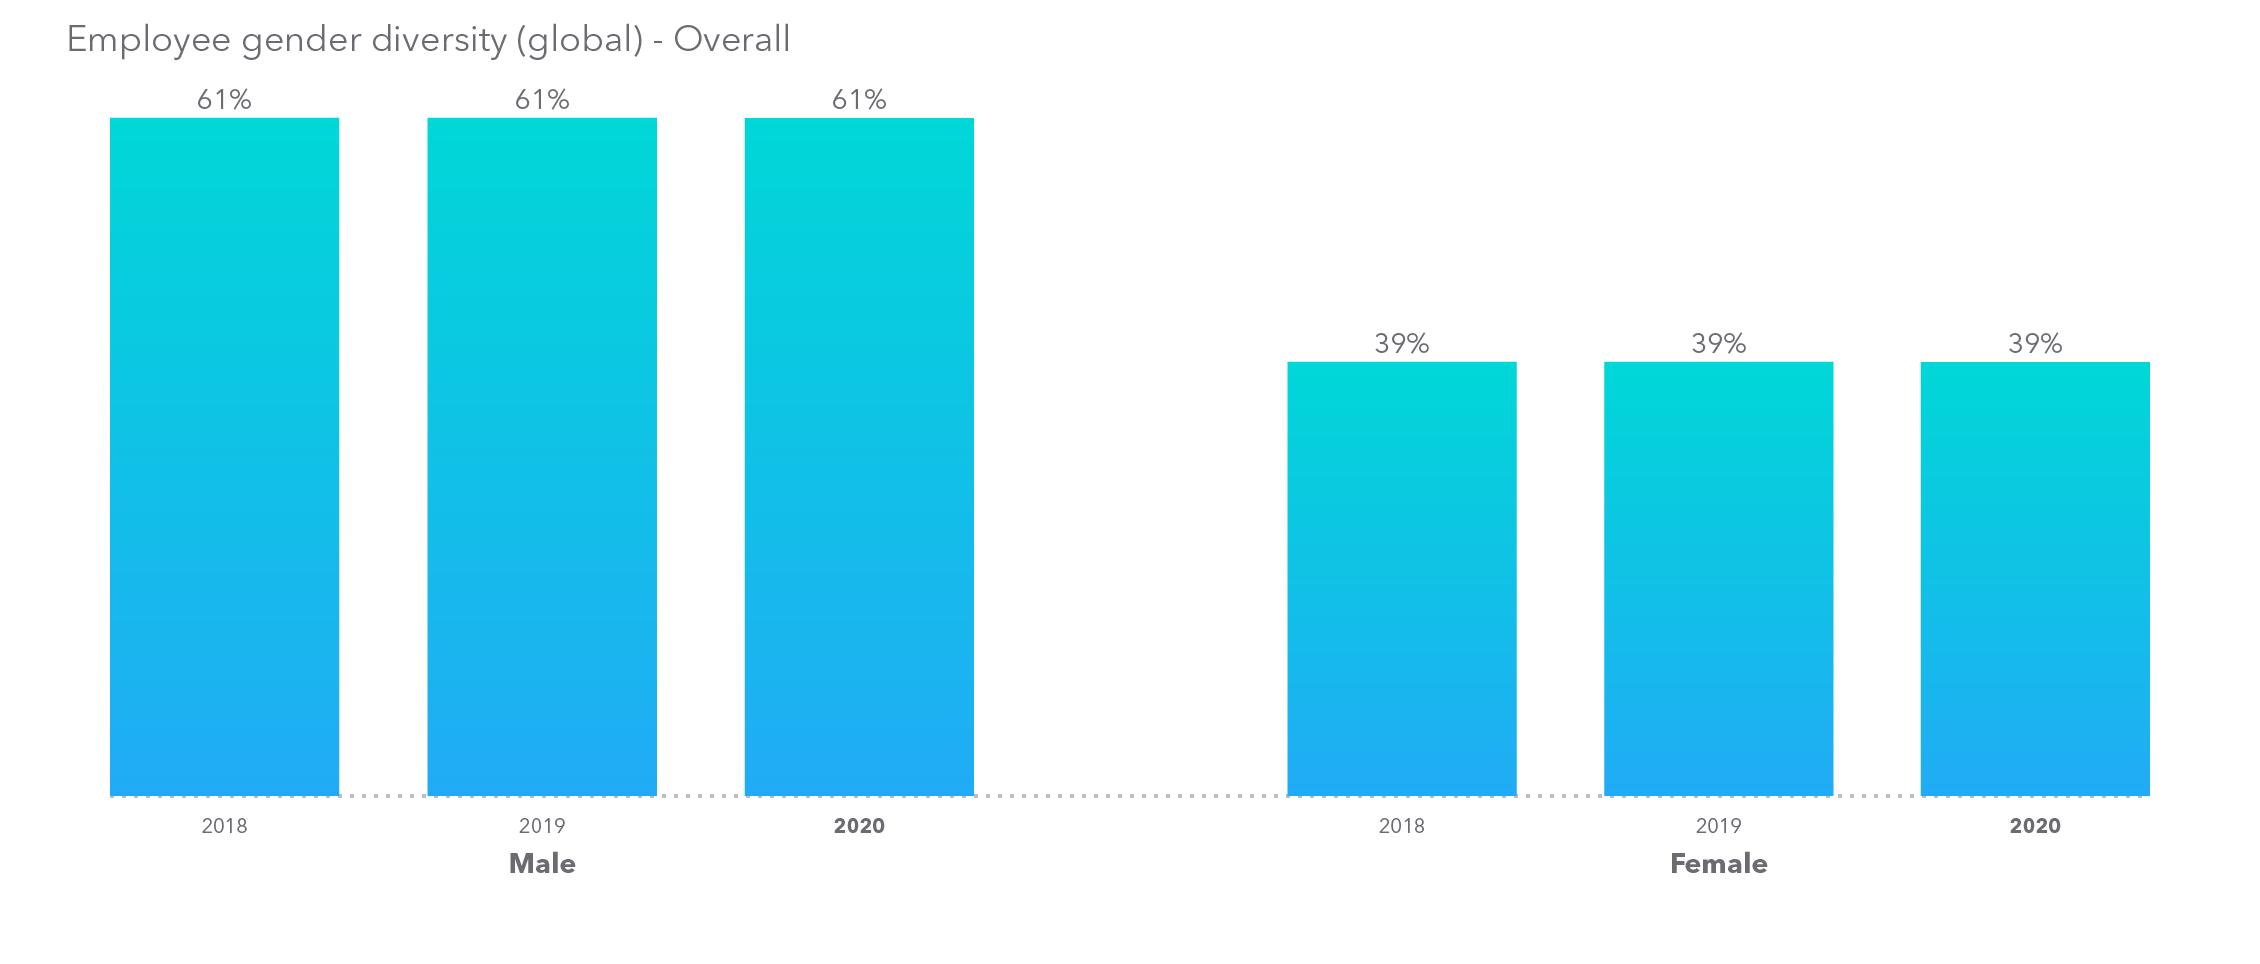 Intuit - Global employee gender diversity data